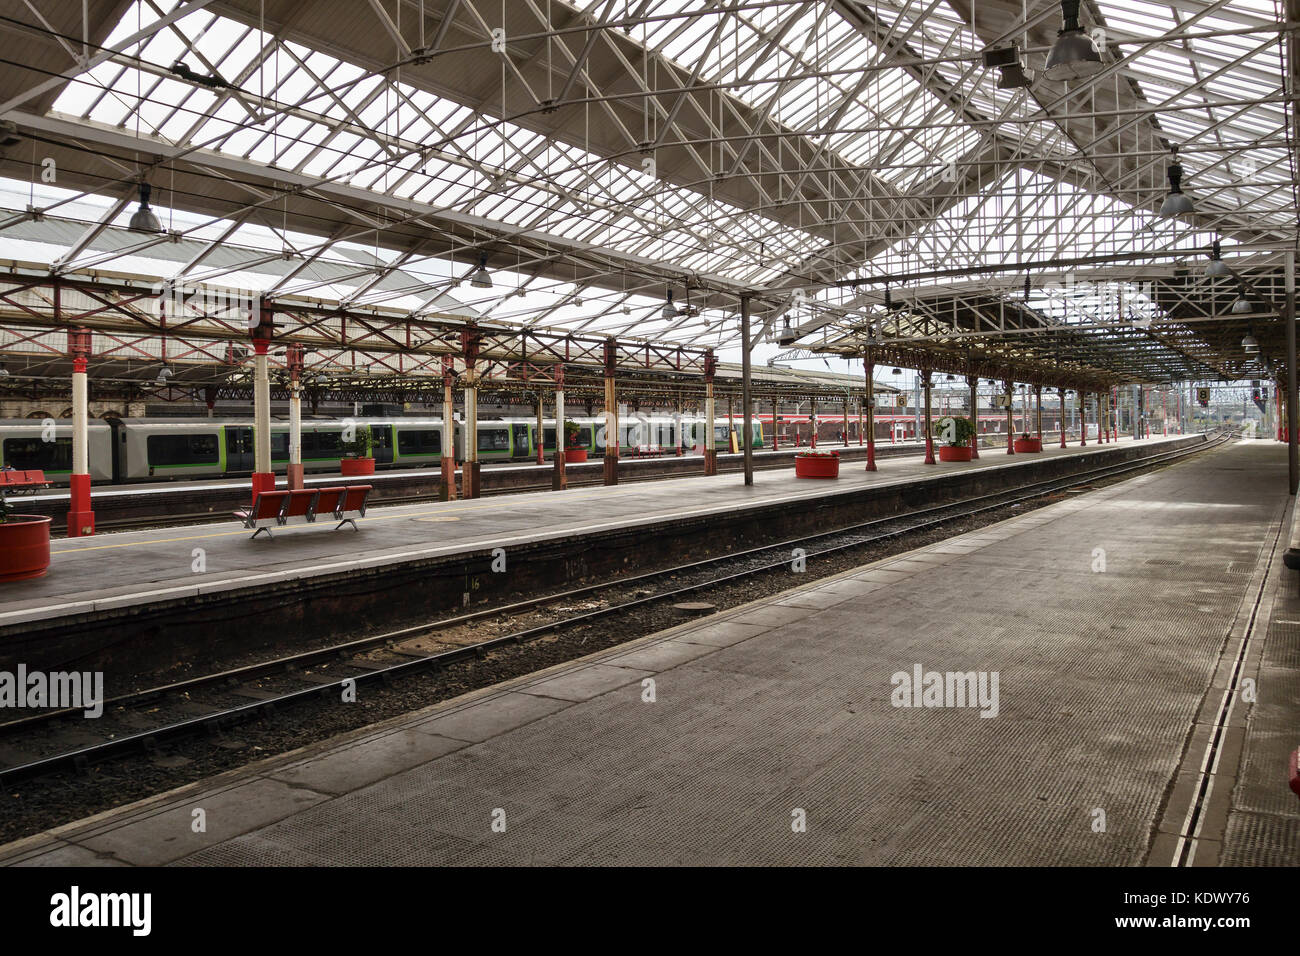 Crewe railway station, Cheshire, UK. First opened in 1837. - Stock Image